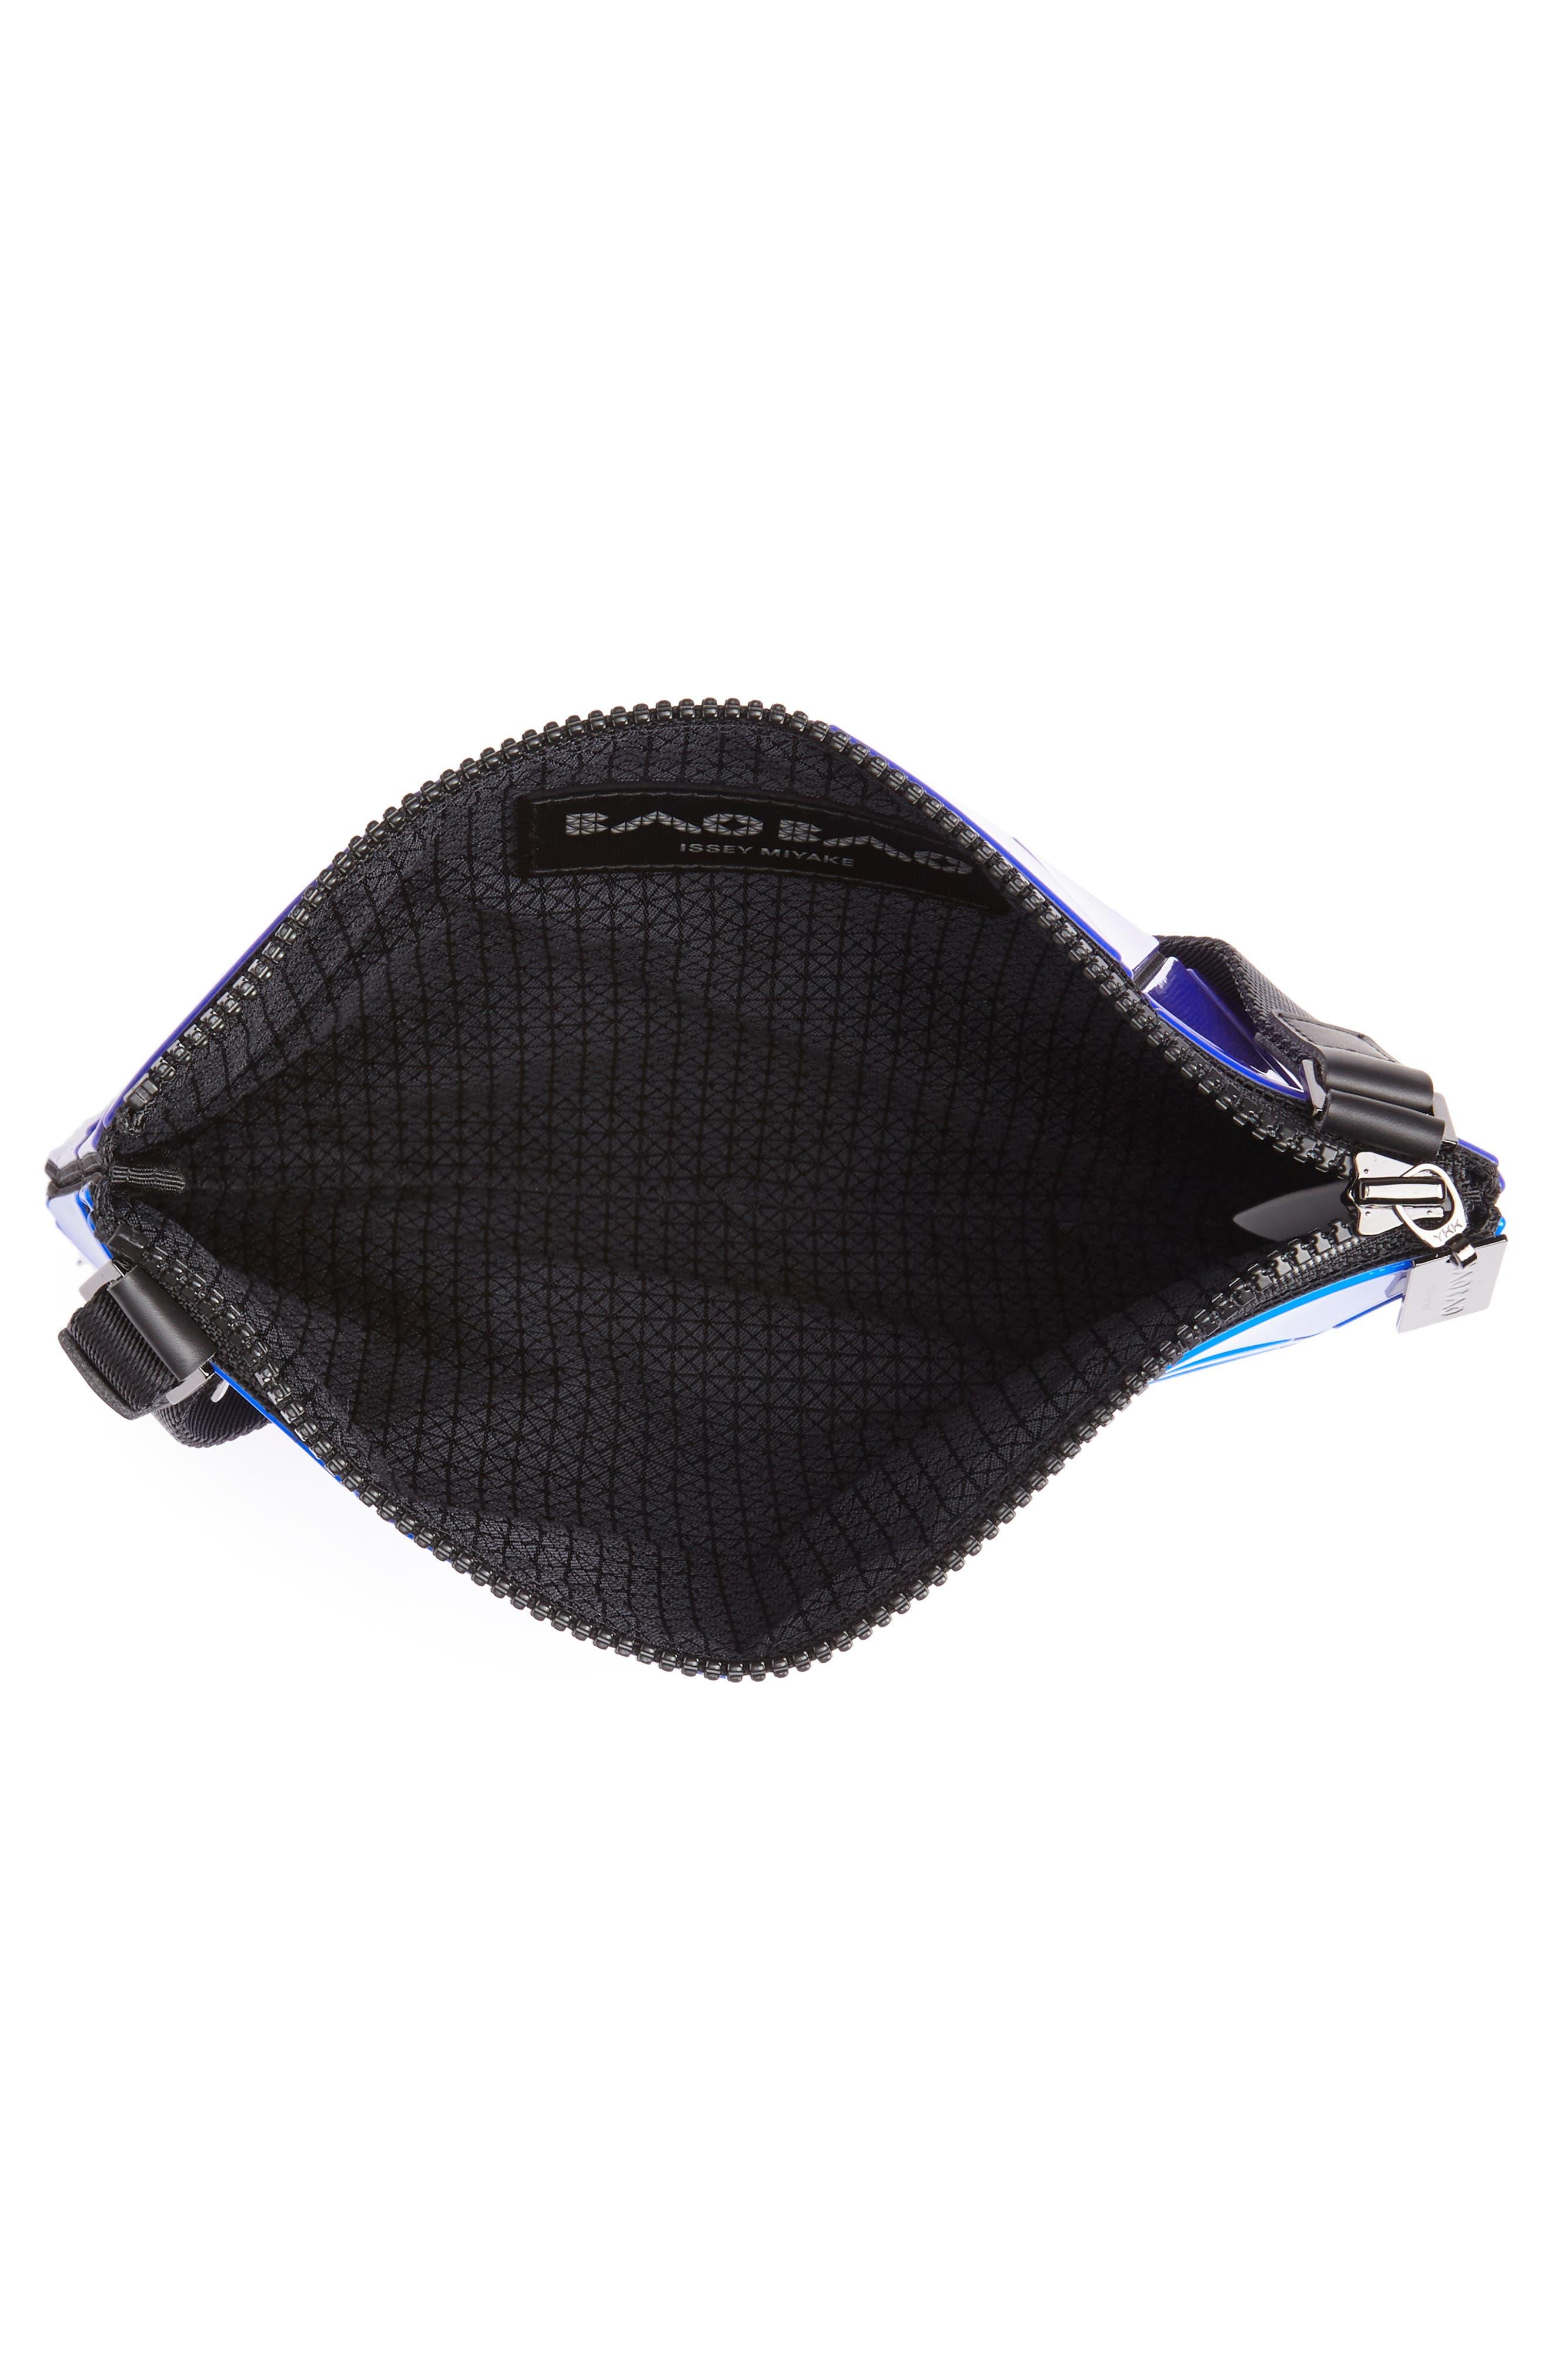 Lucent Two-Tone Crossbody Bag,                             Alternate thumbnail 4, color,                             BLUE/ DARK BLUE